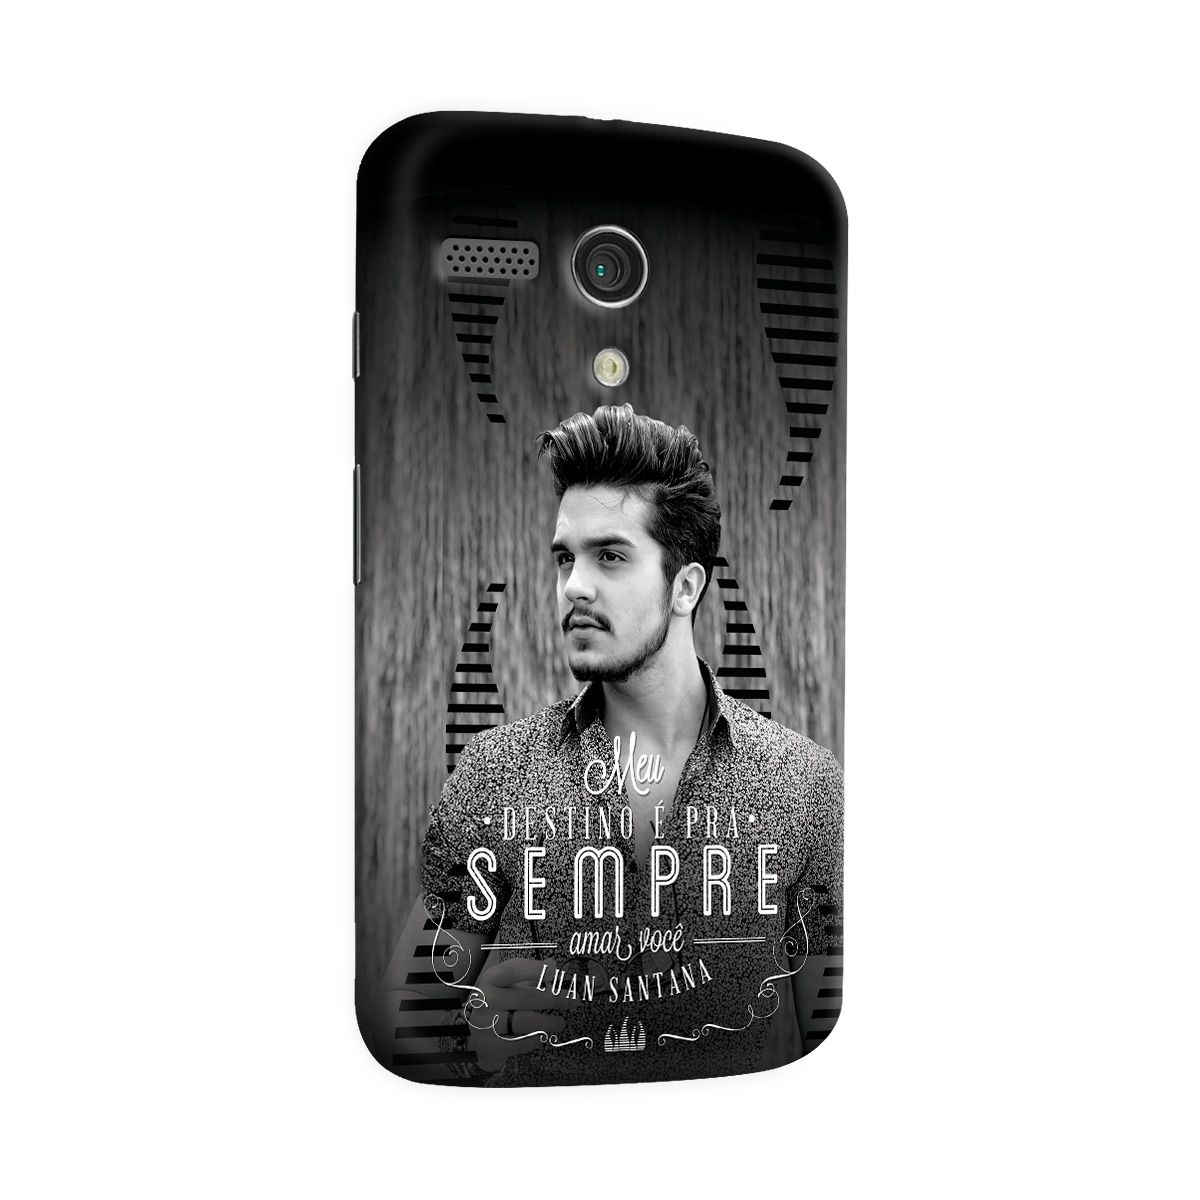 Capa para Motorola Moto G 1 Luan Santana Meu Destino P&B